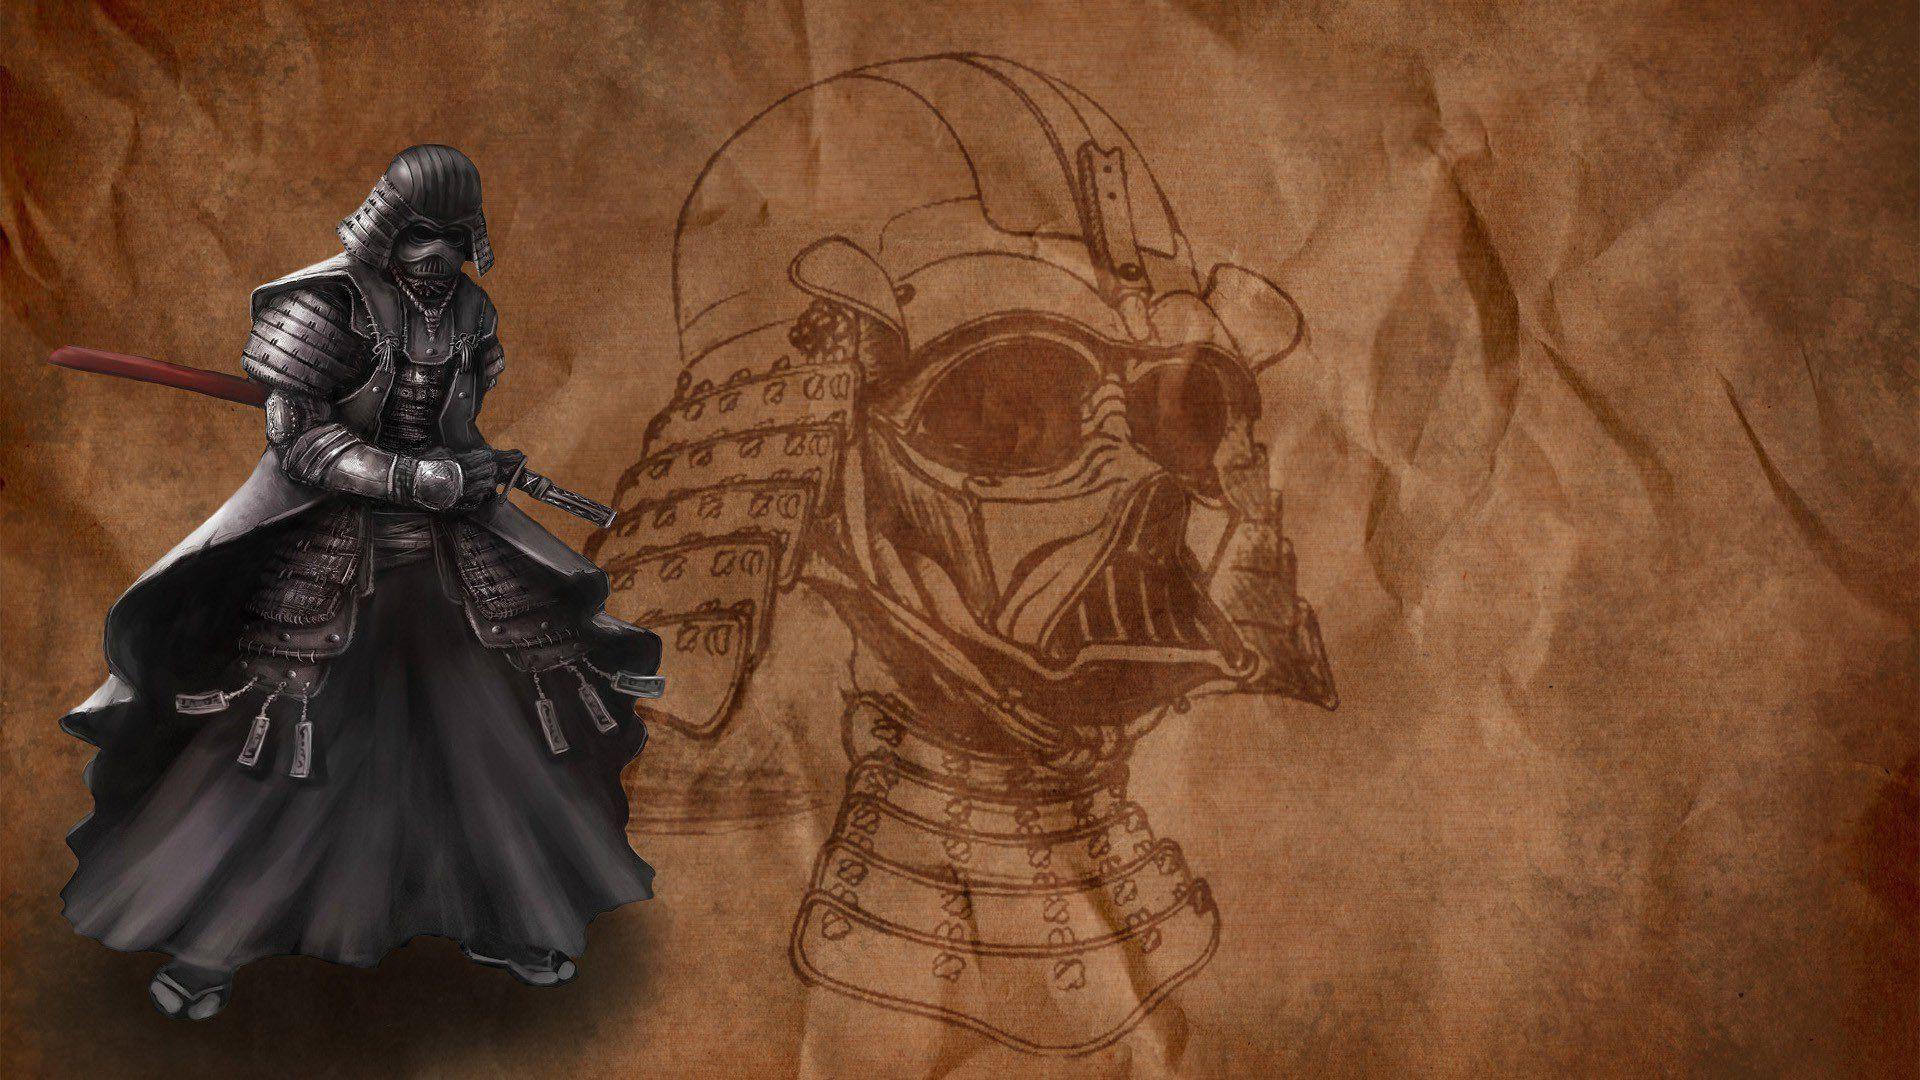 Star Wars Samurai Wallpapers Top Free Star Wars Samurai Backgrounds Wallpaperaccess